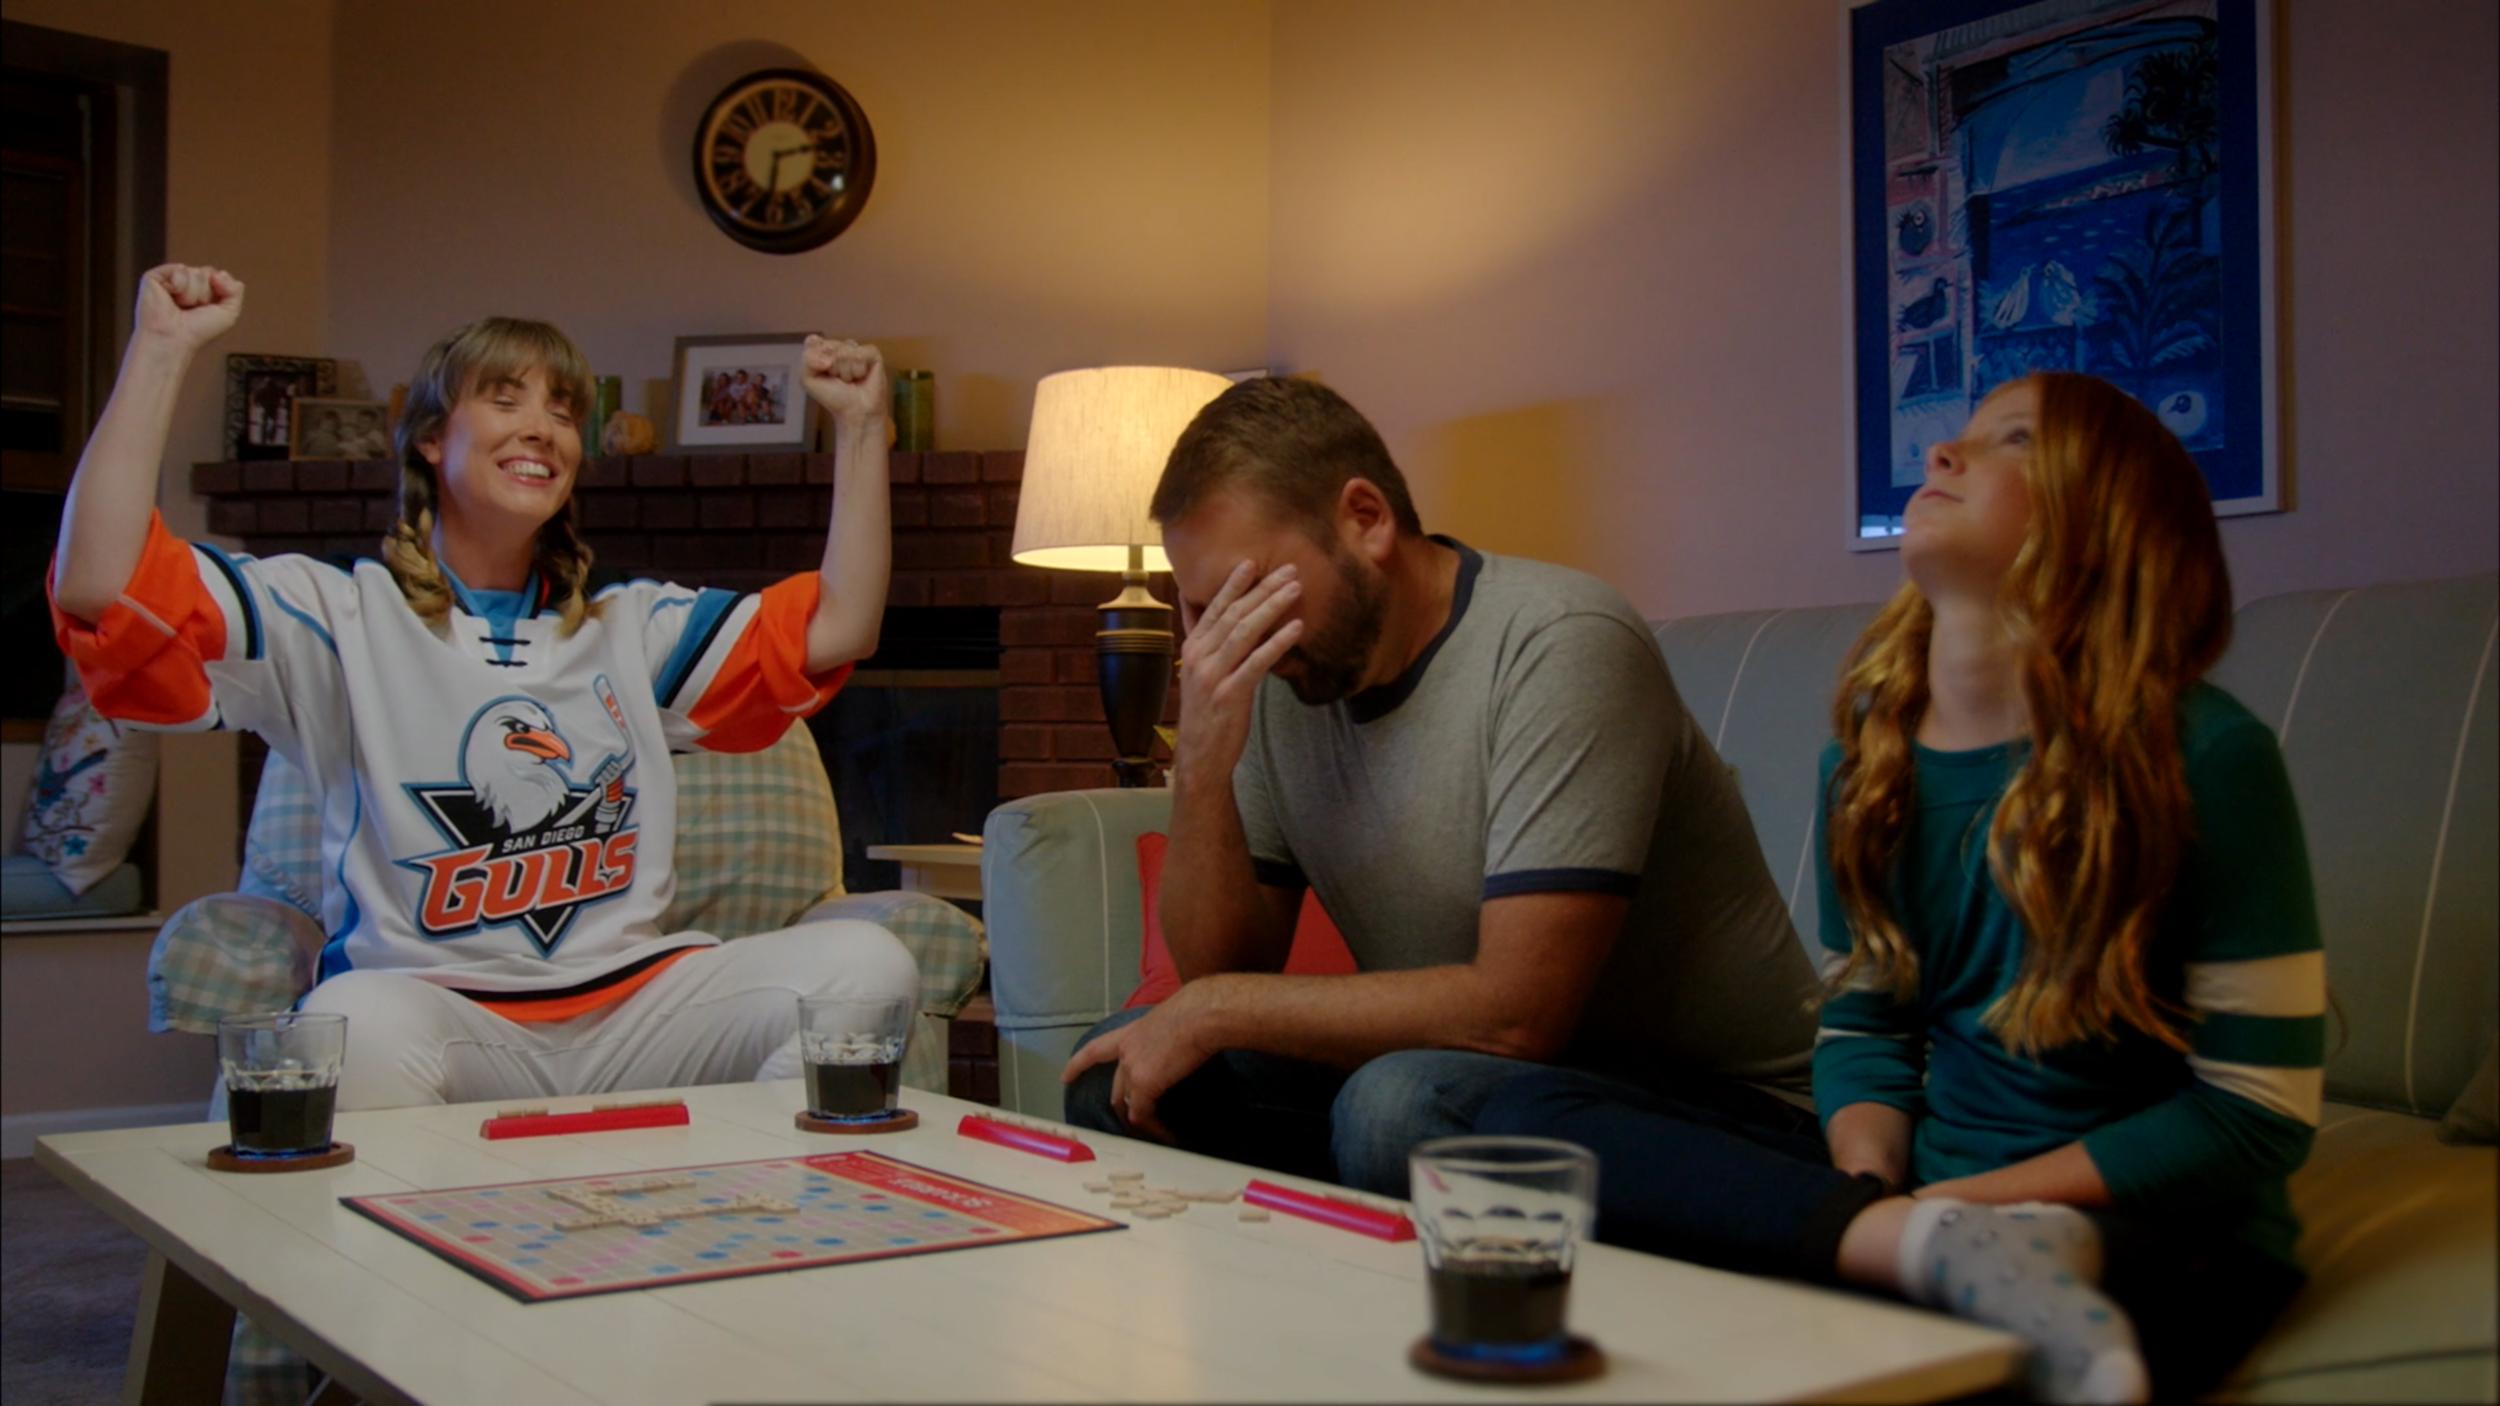 CINEMATOGRAPHER CESAR ANDRE GULLS FAMILY TIME FRAME 3.png